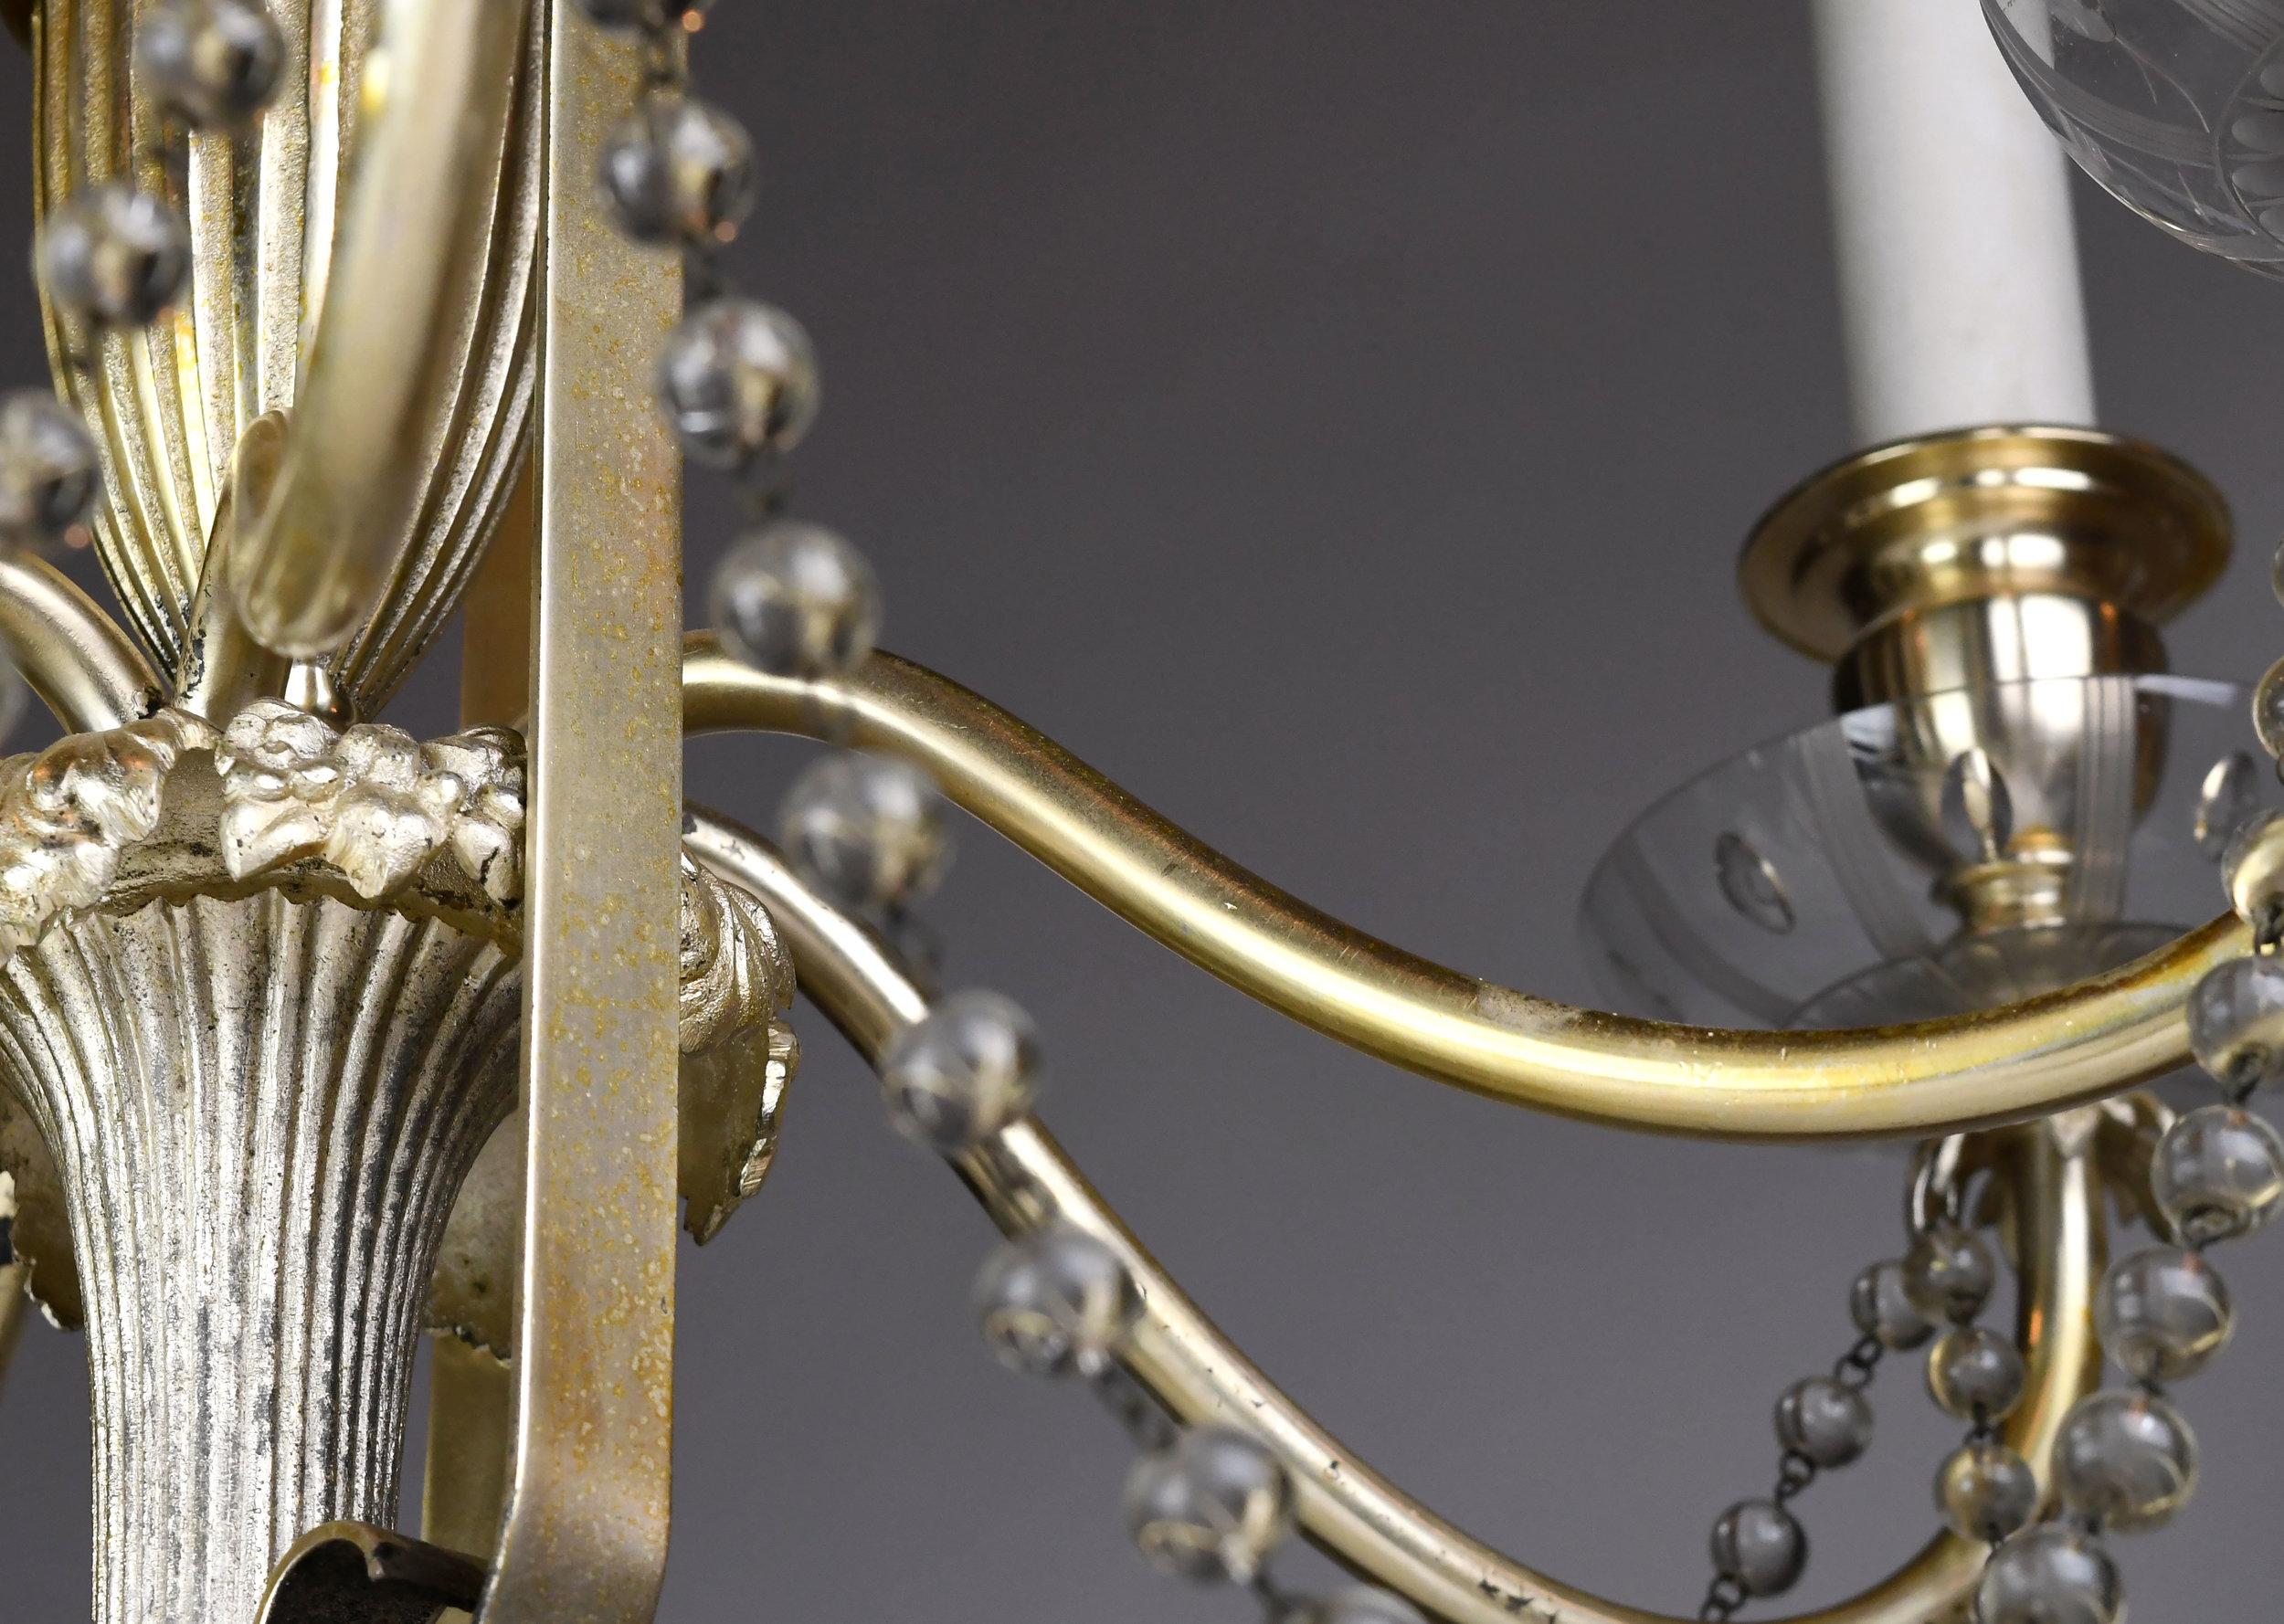 47326-bradley-hubbard-six-arm-chandelier-more-details.jpg